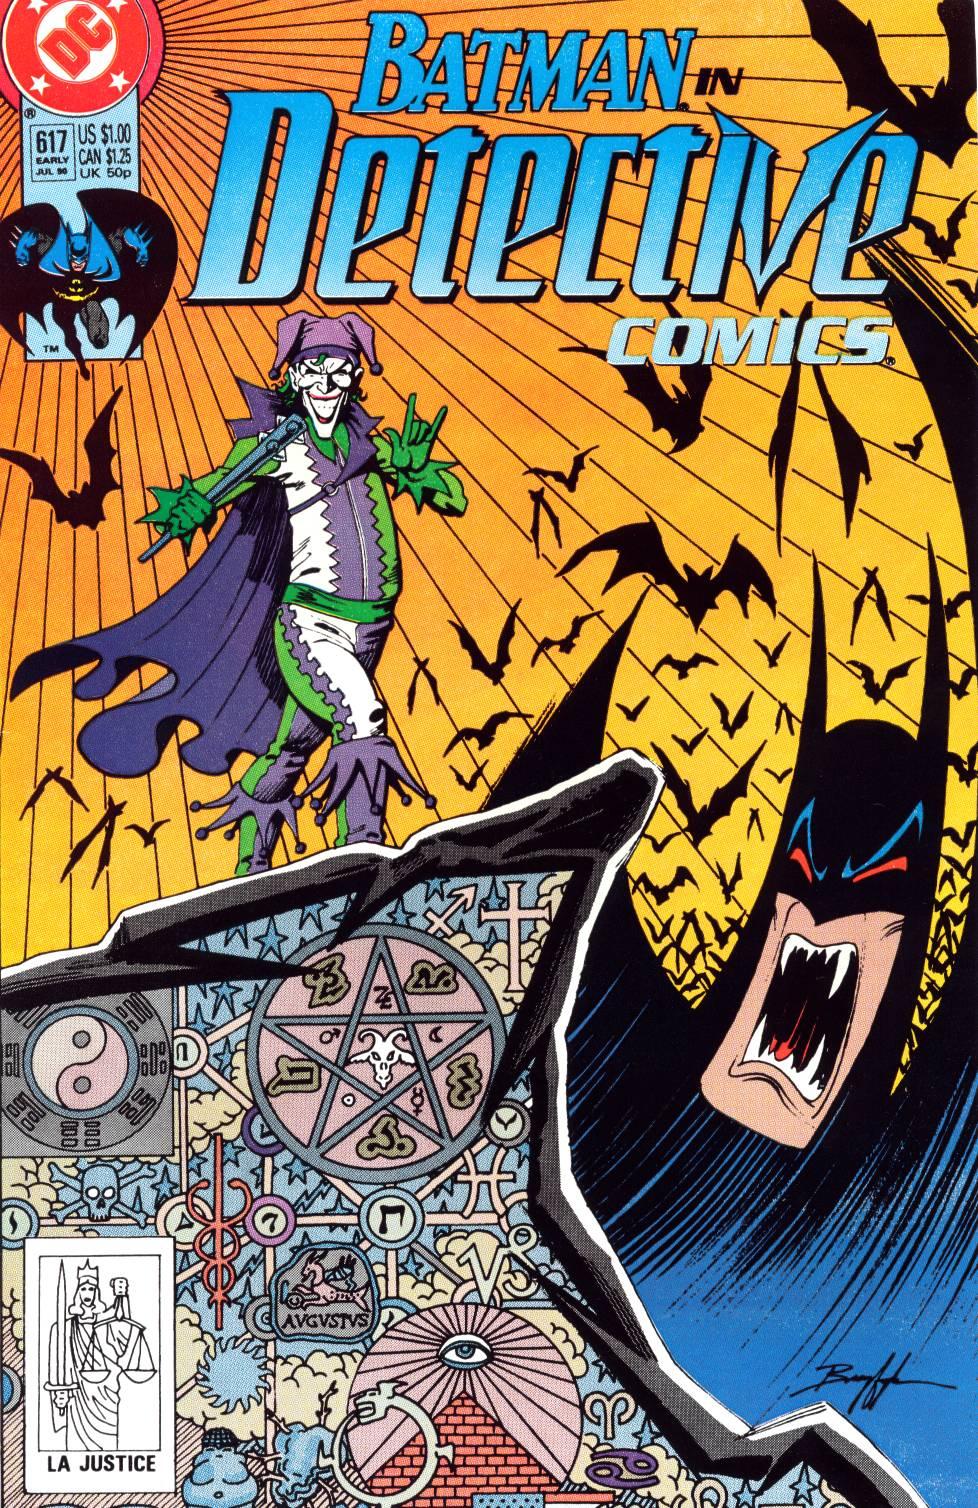 Detective Comics (1937) 617 Page 0